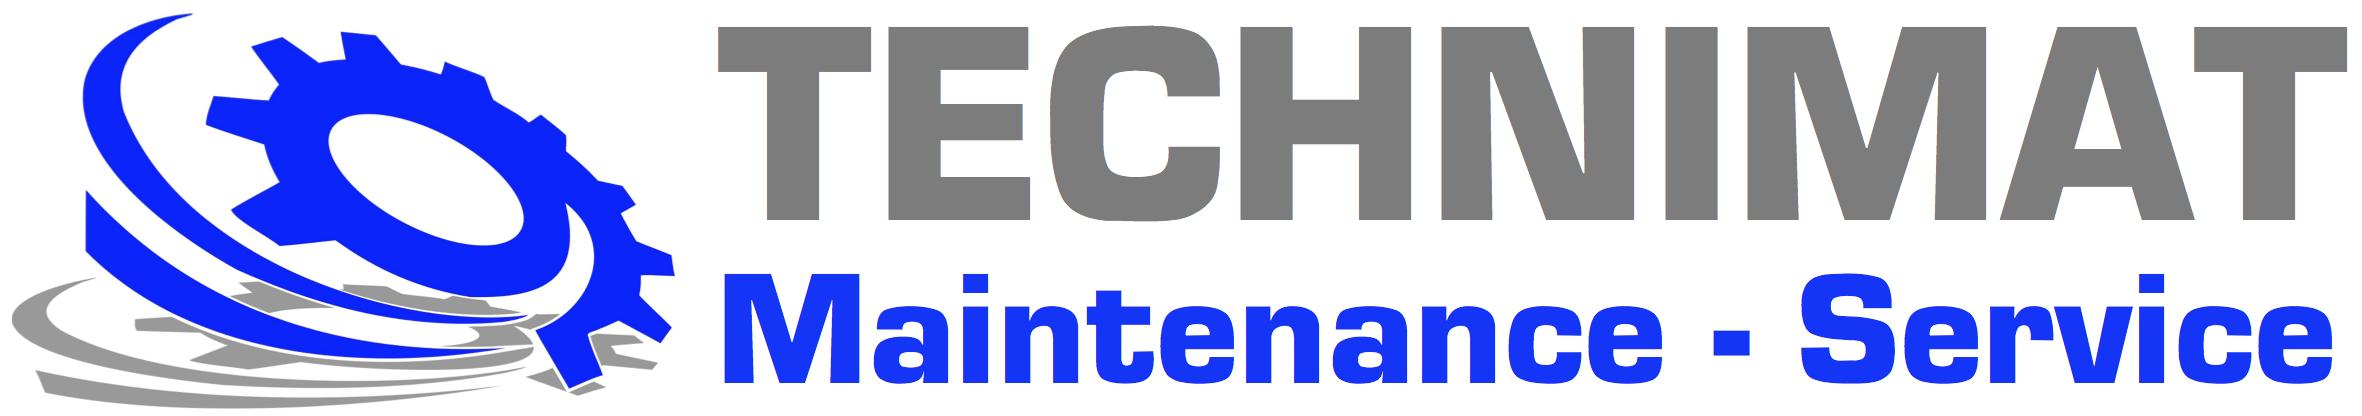 Technimat service